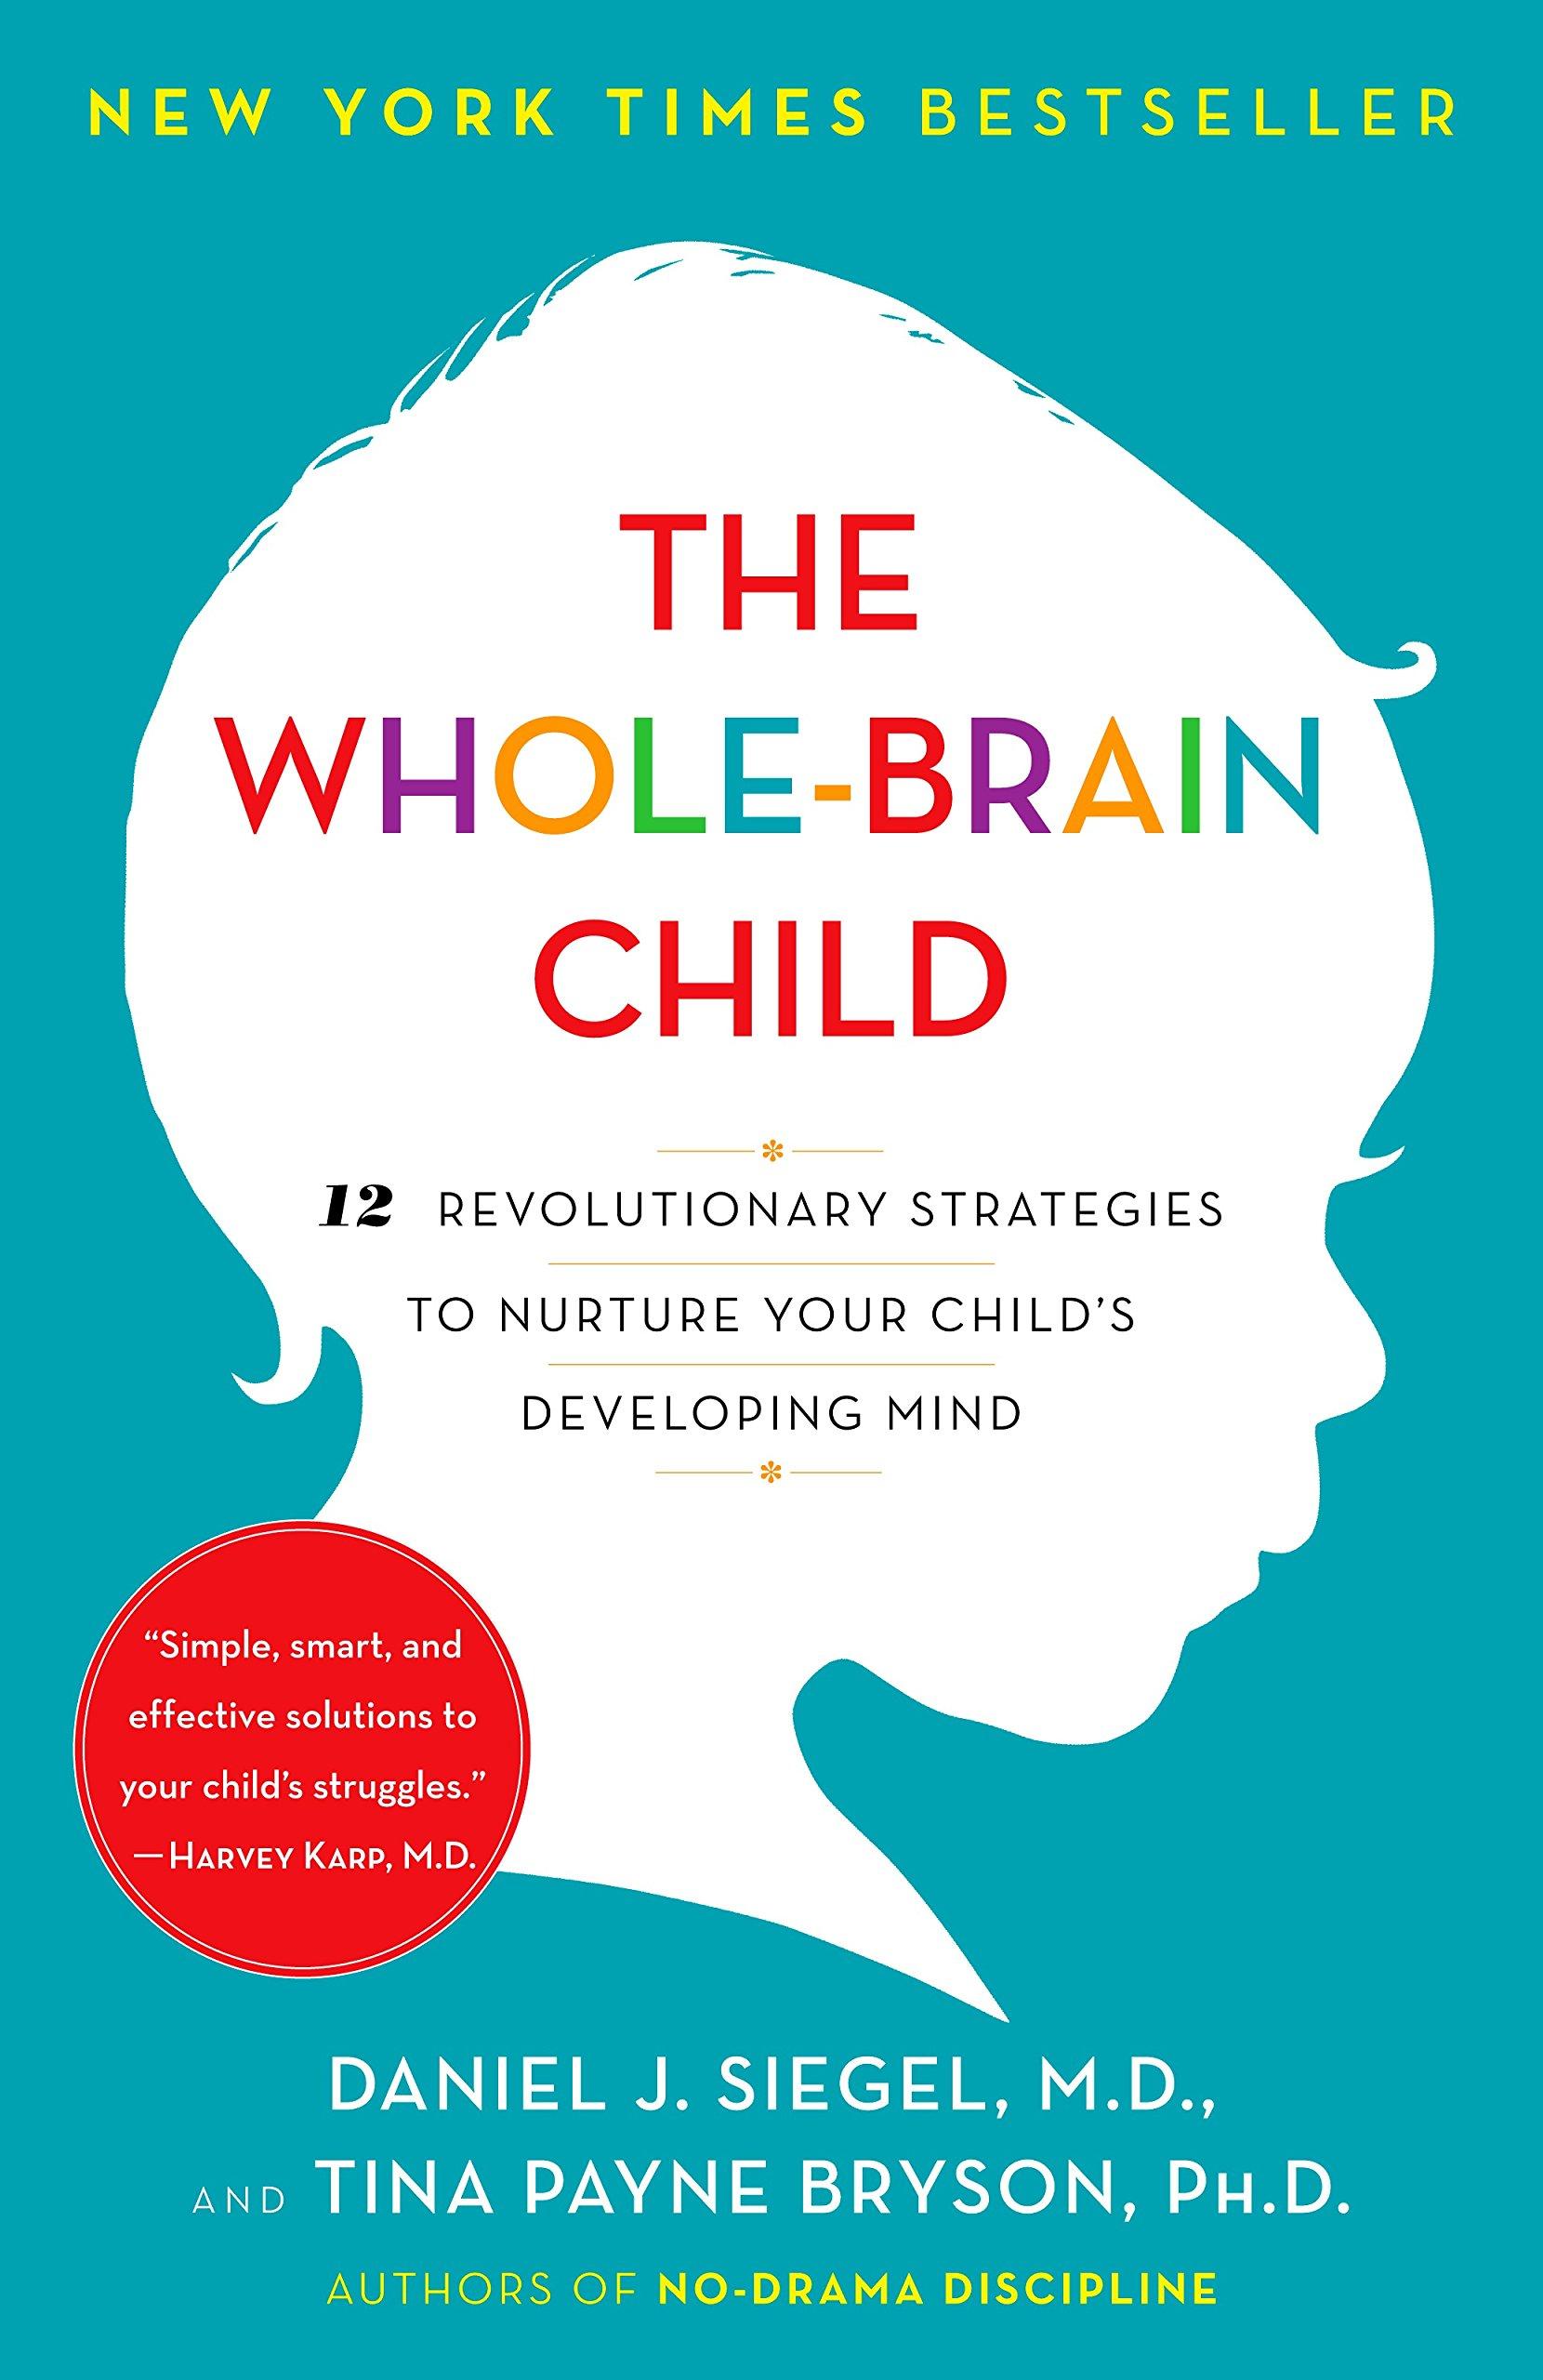 The Whole-Brain Child Summary